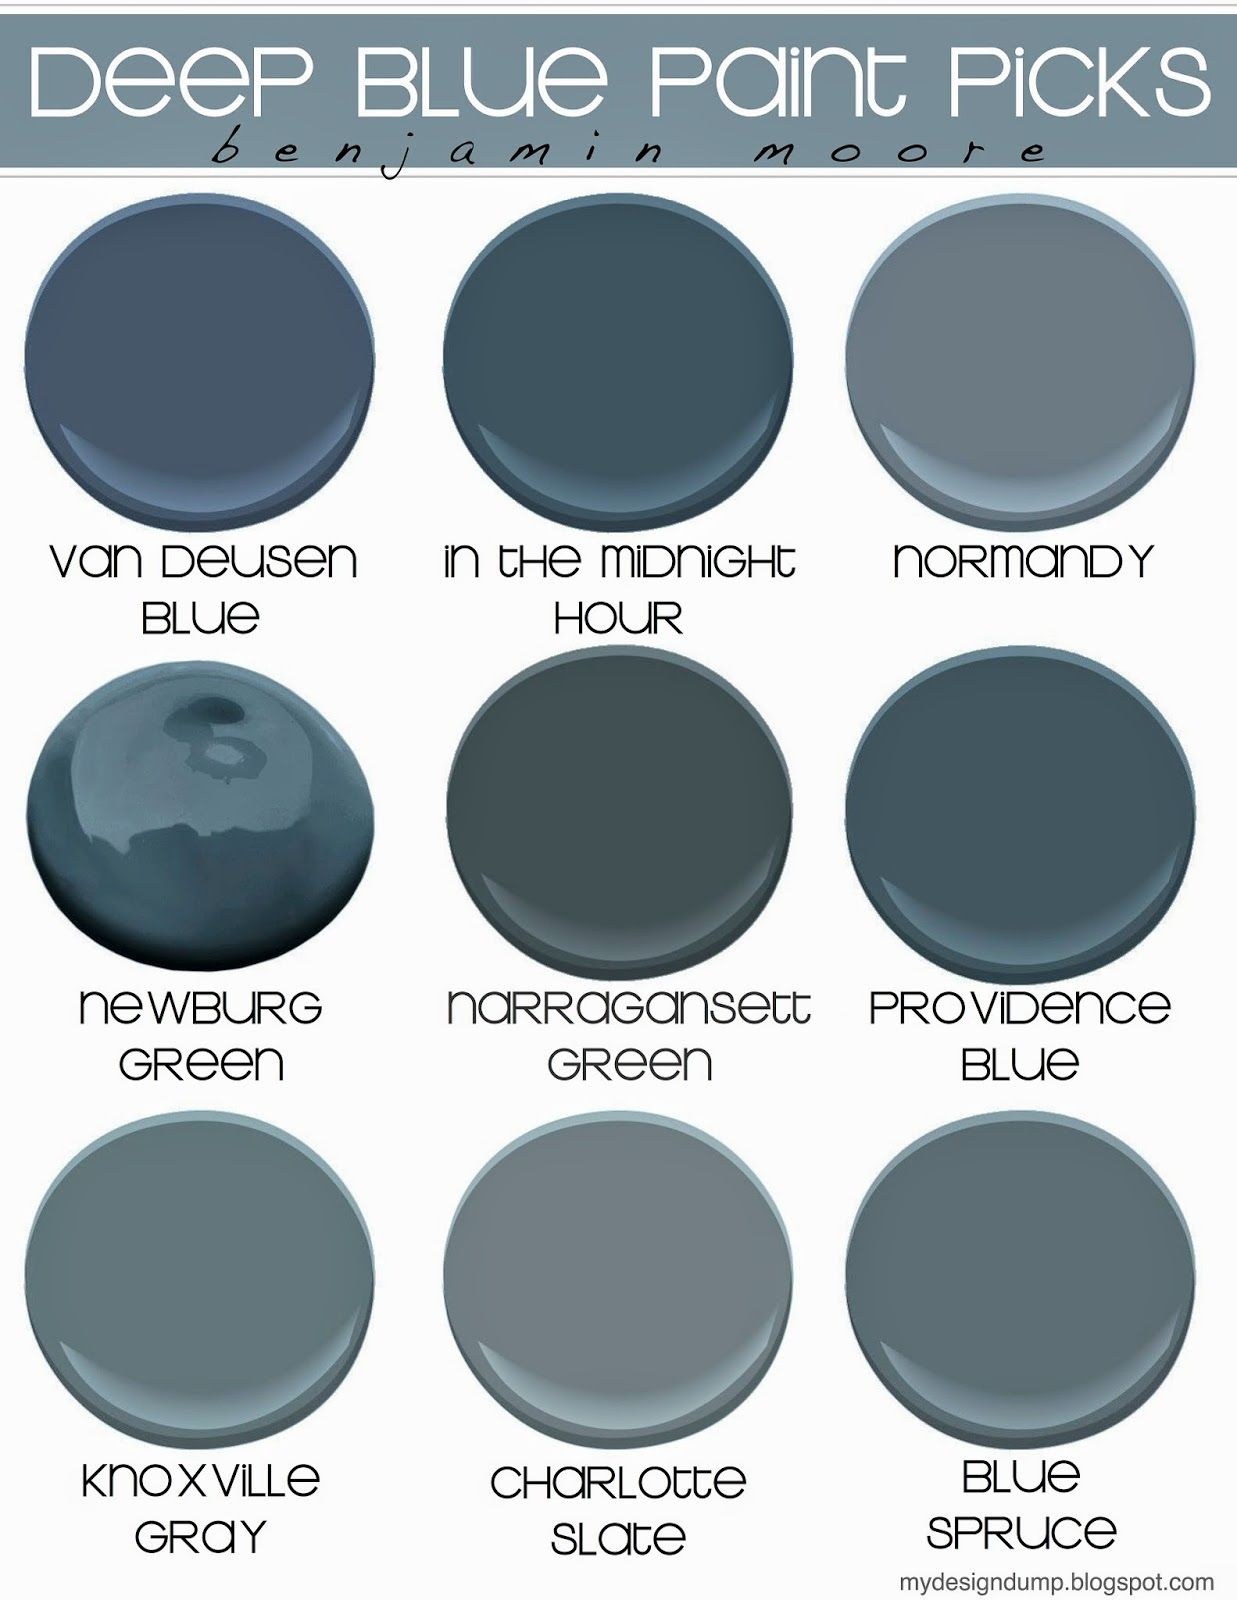 Blue Gray Paint Colors Deep Blue Moody Blue Paint Picksbenjamin Mooredesign Dump